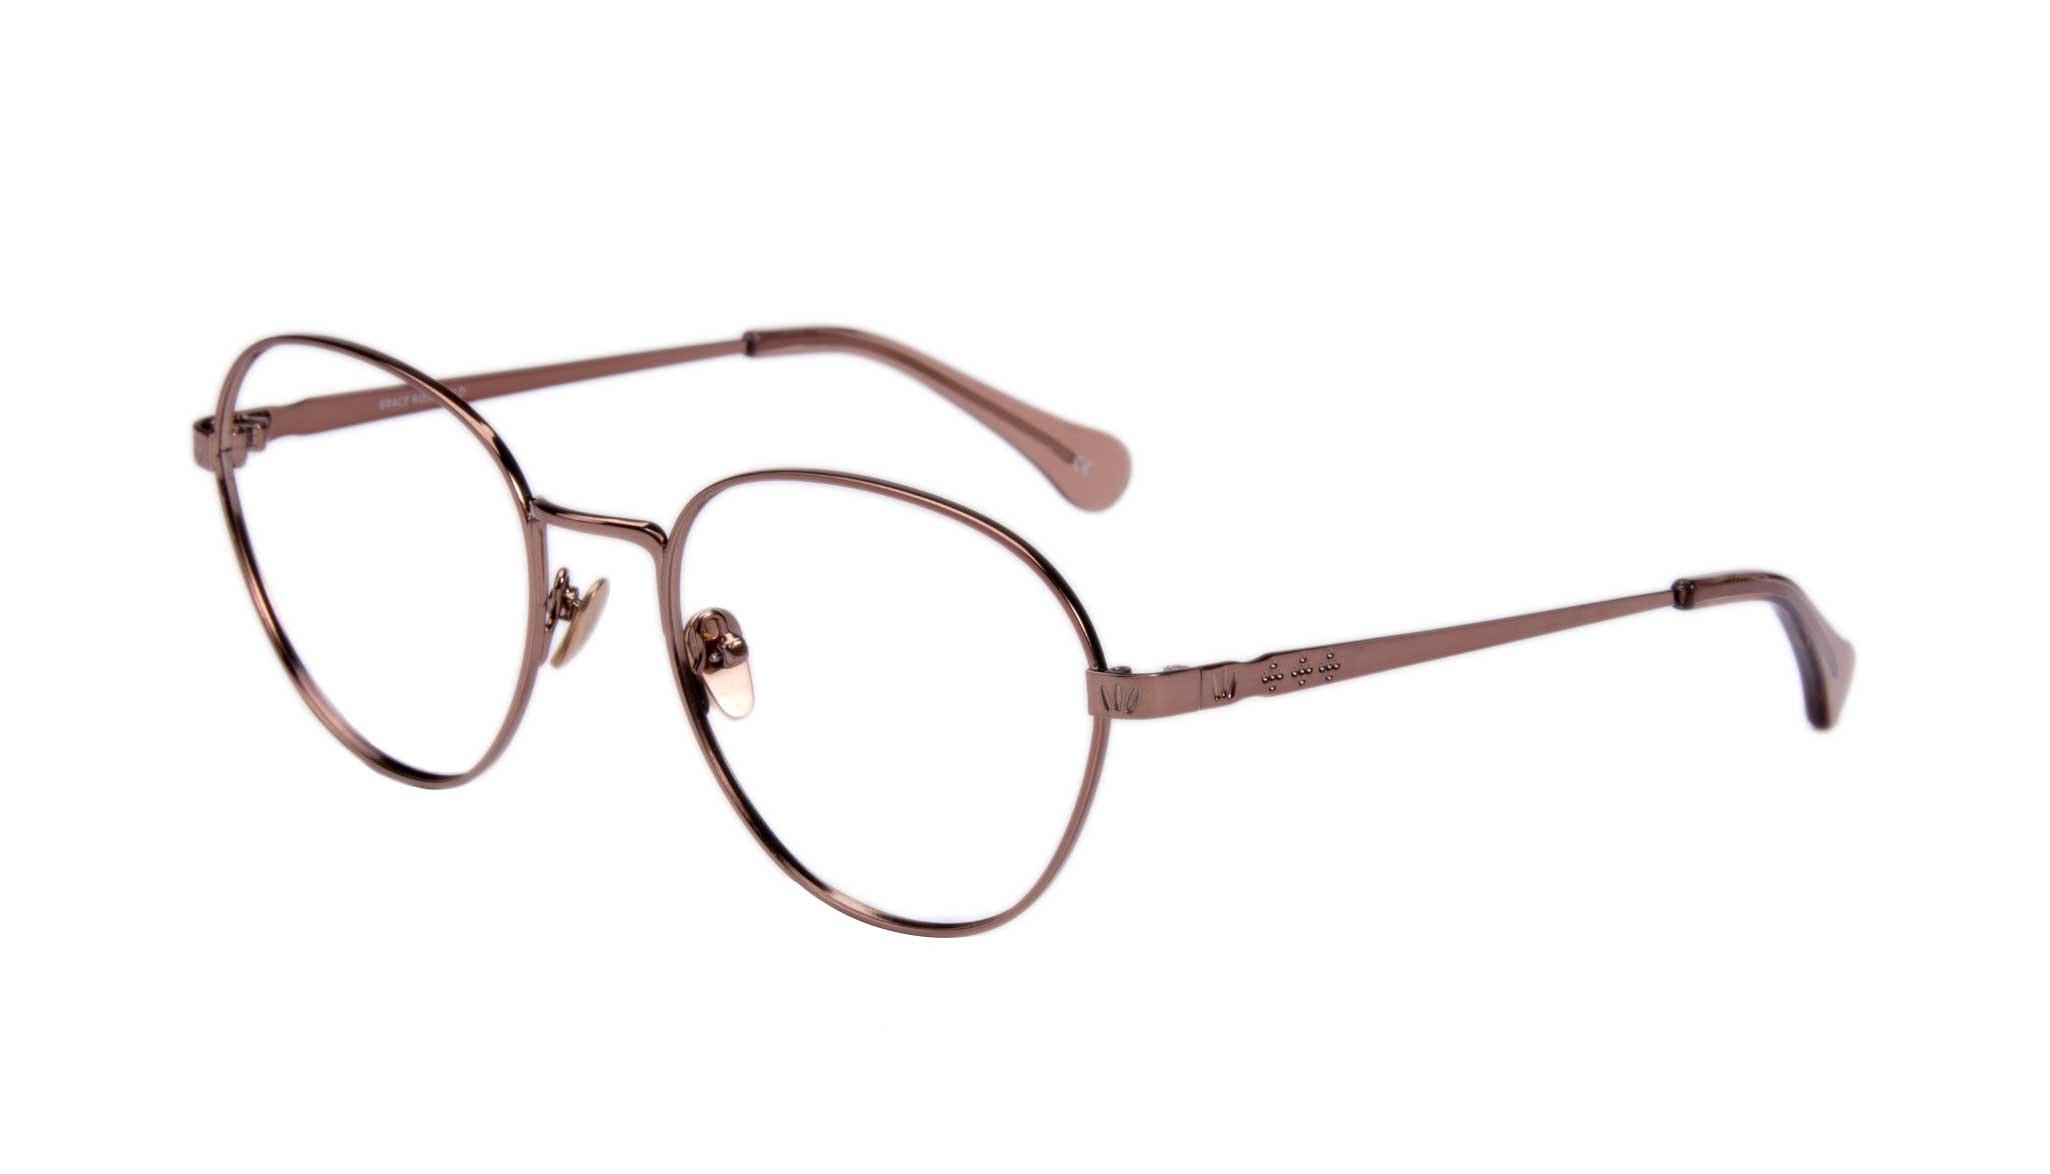 Affordable Fashion Glasses Round Eyeglasses Women Brace Rose Gold Tilt